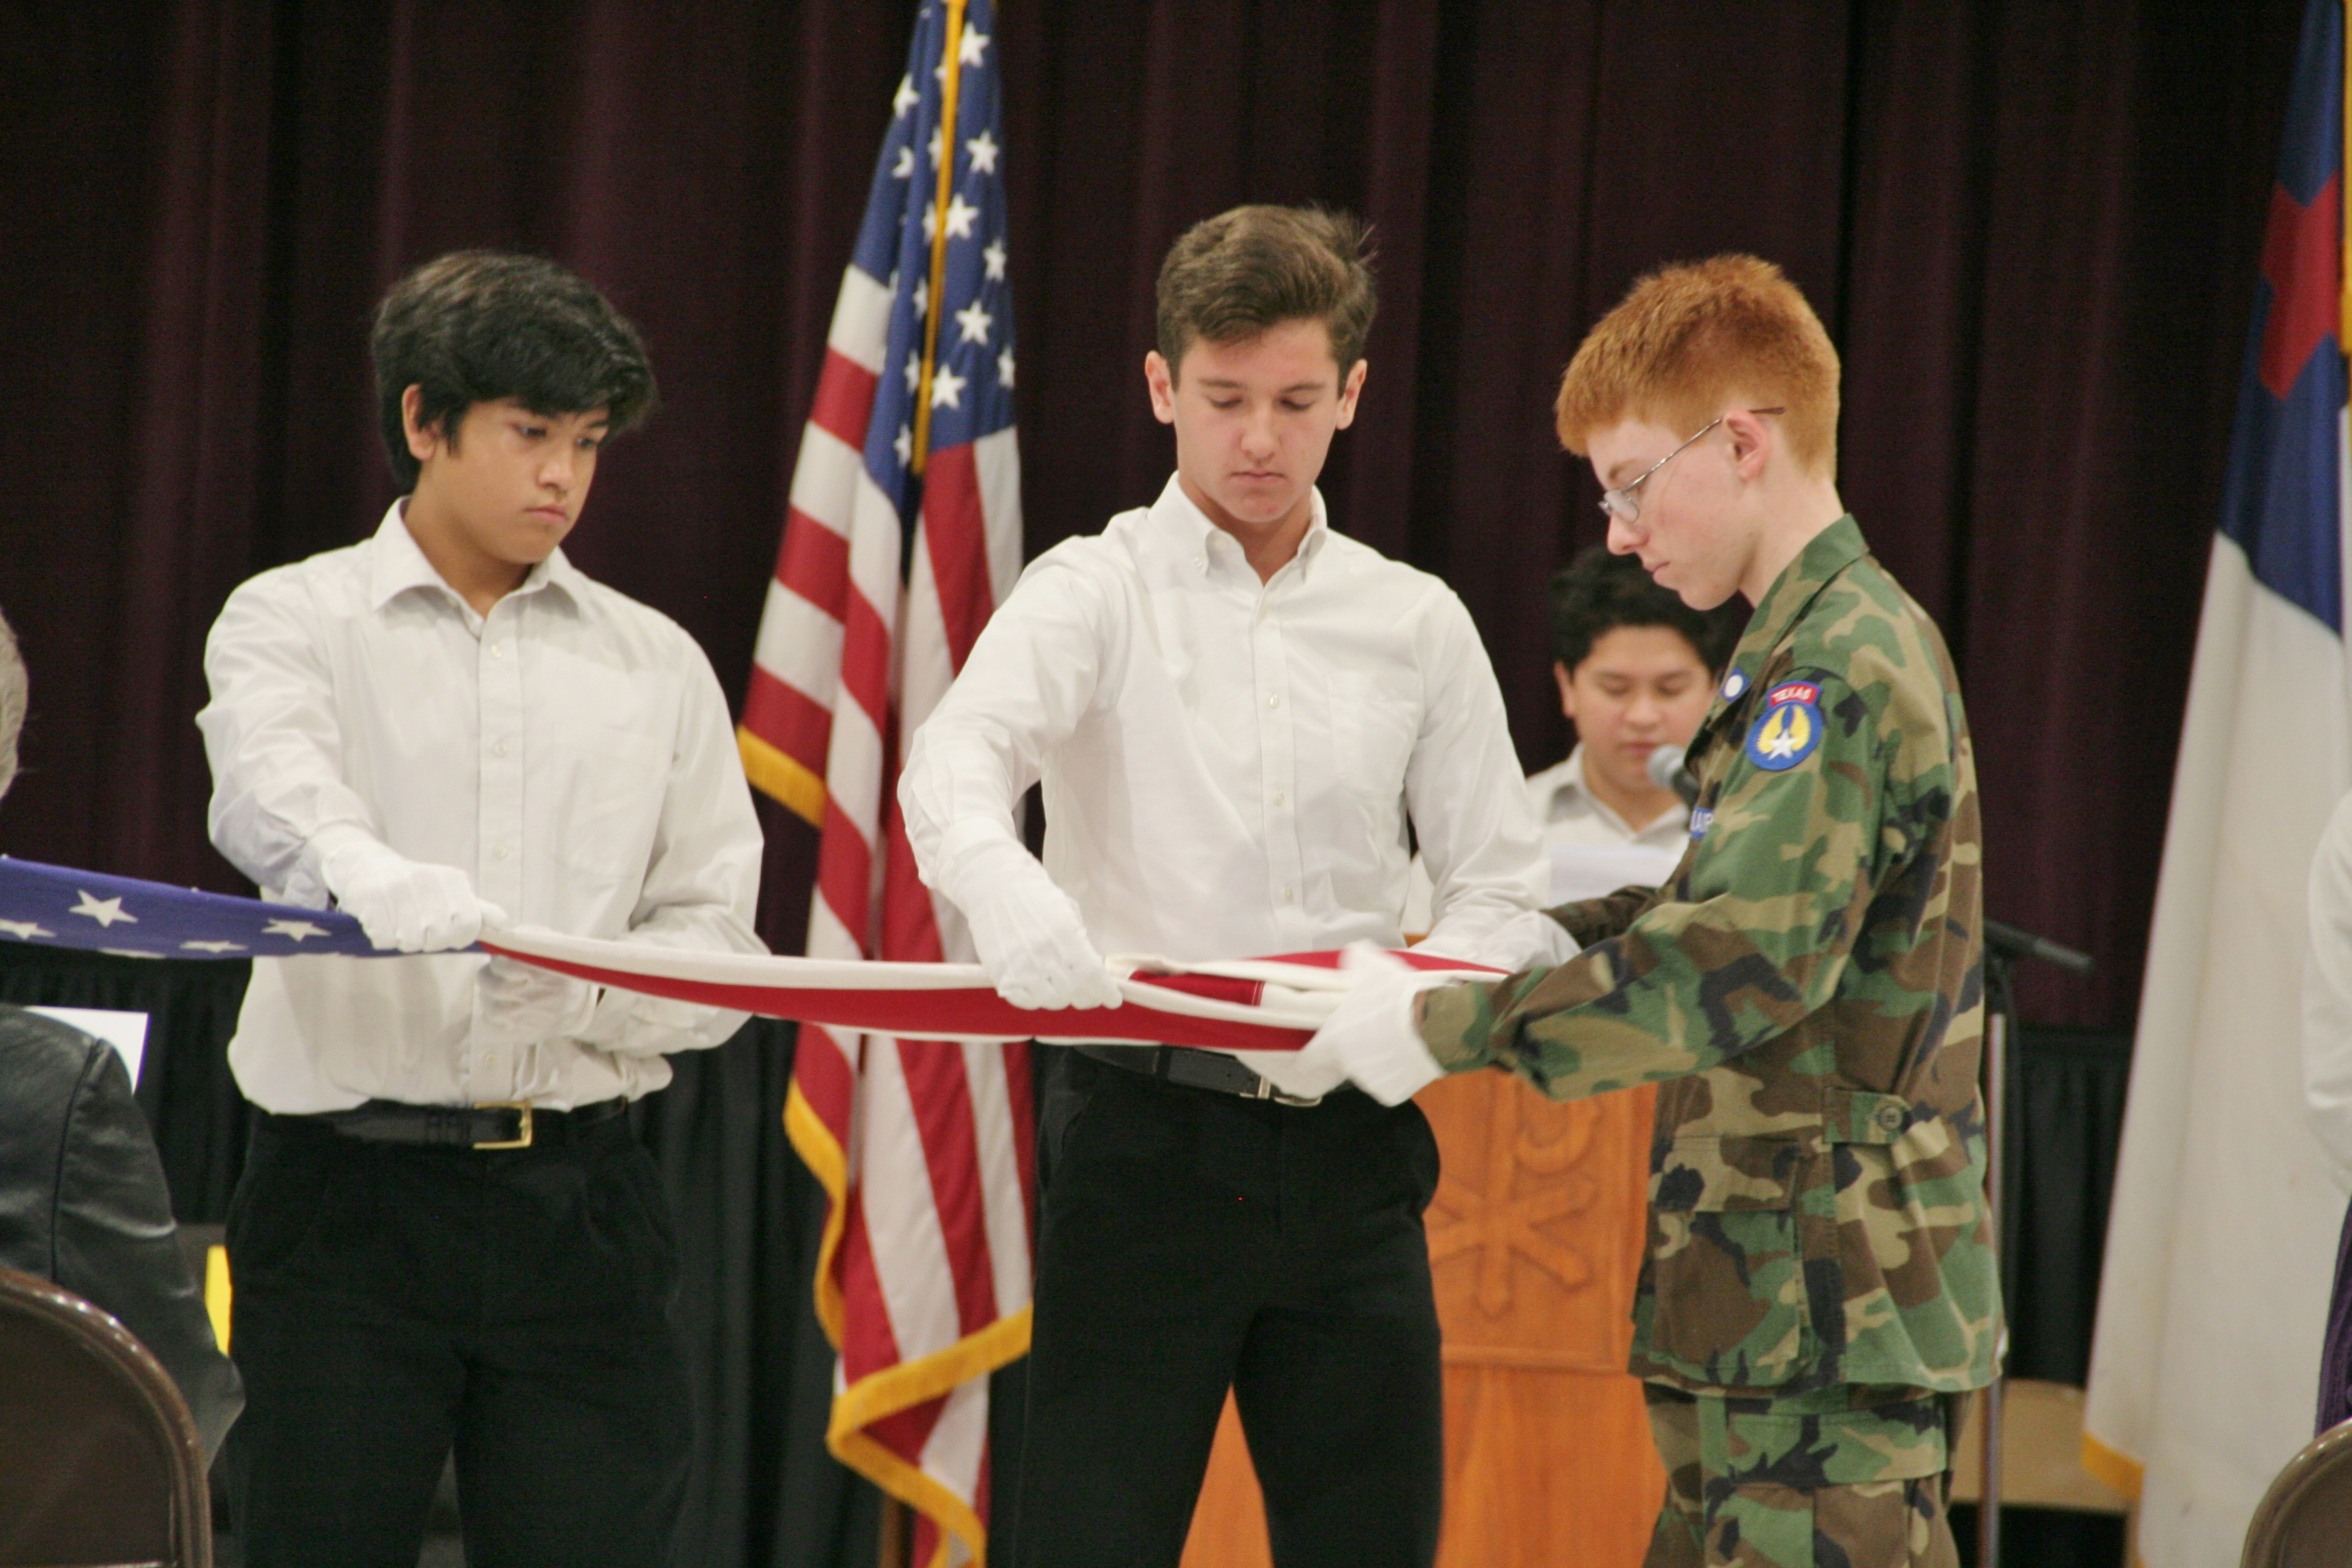 Plano Veterans Day assembly